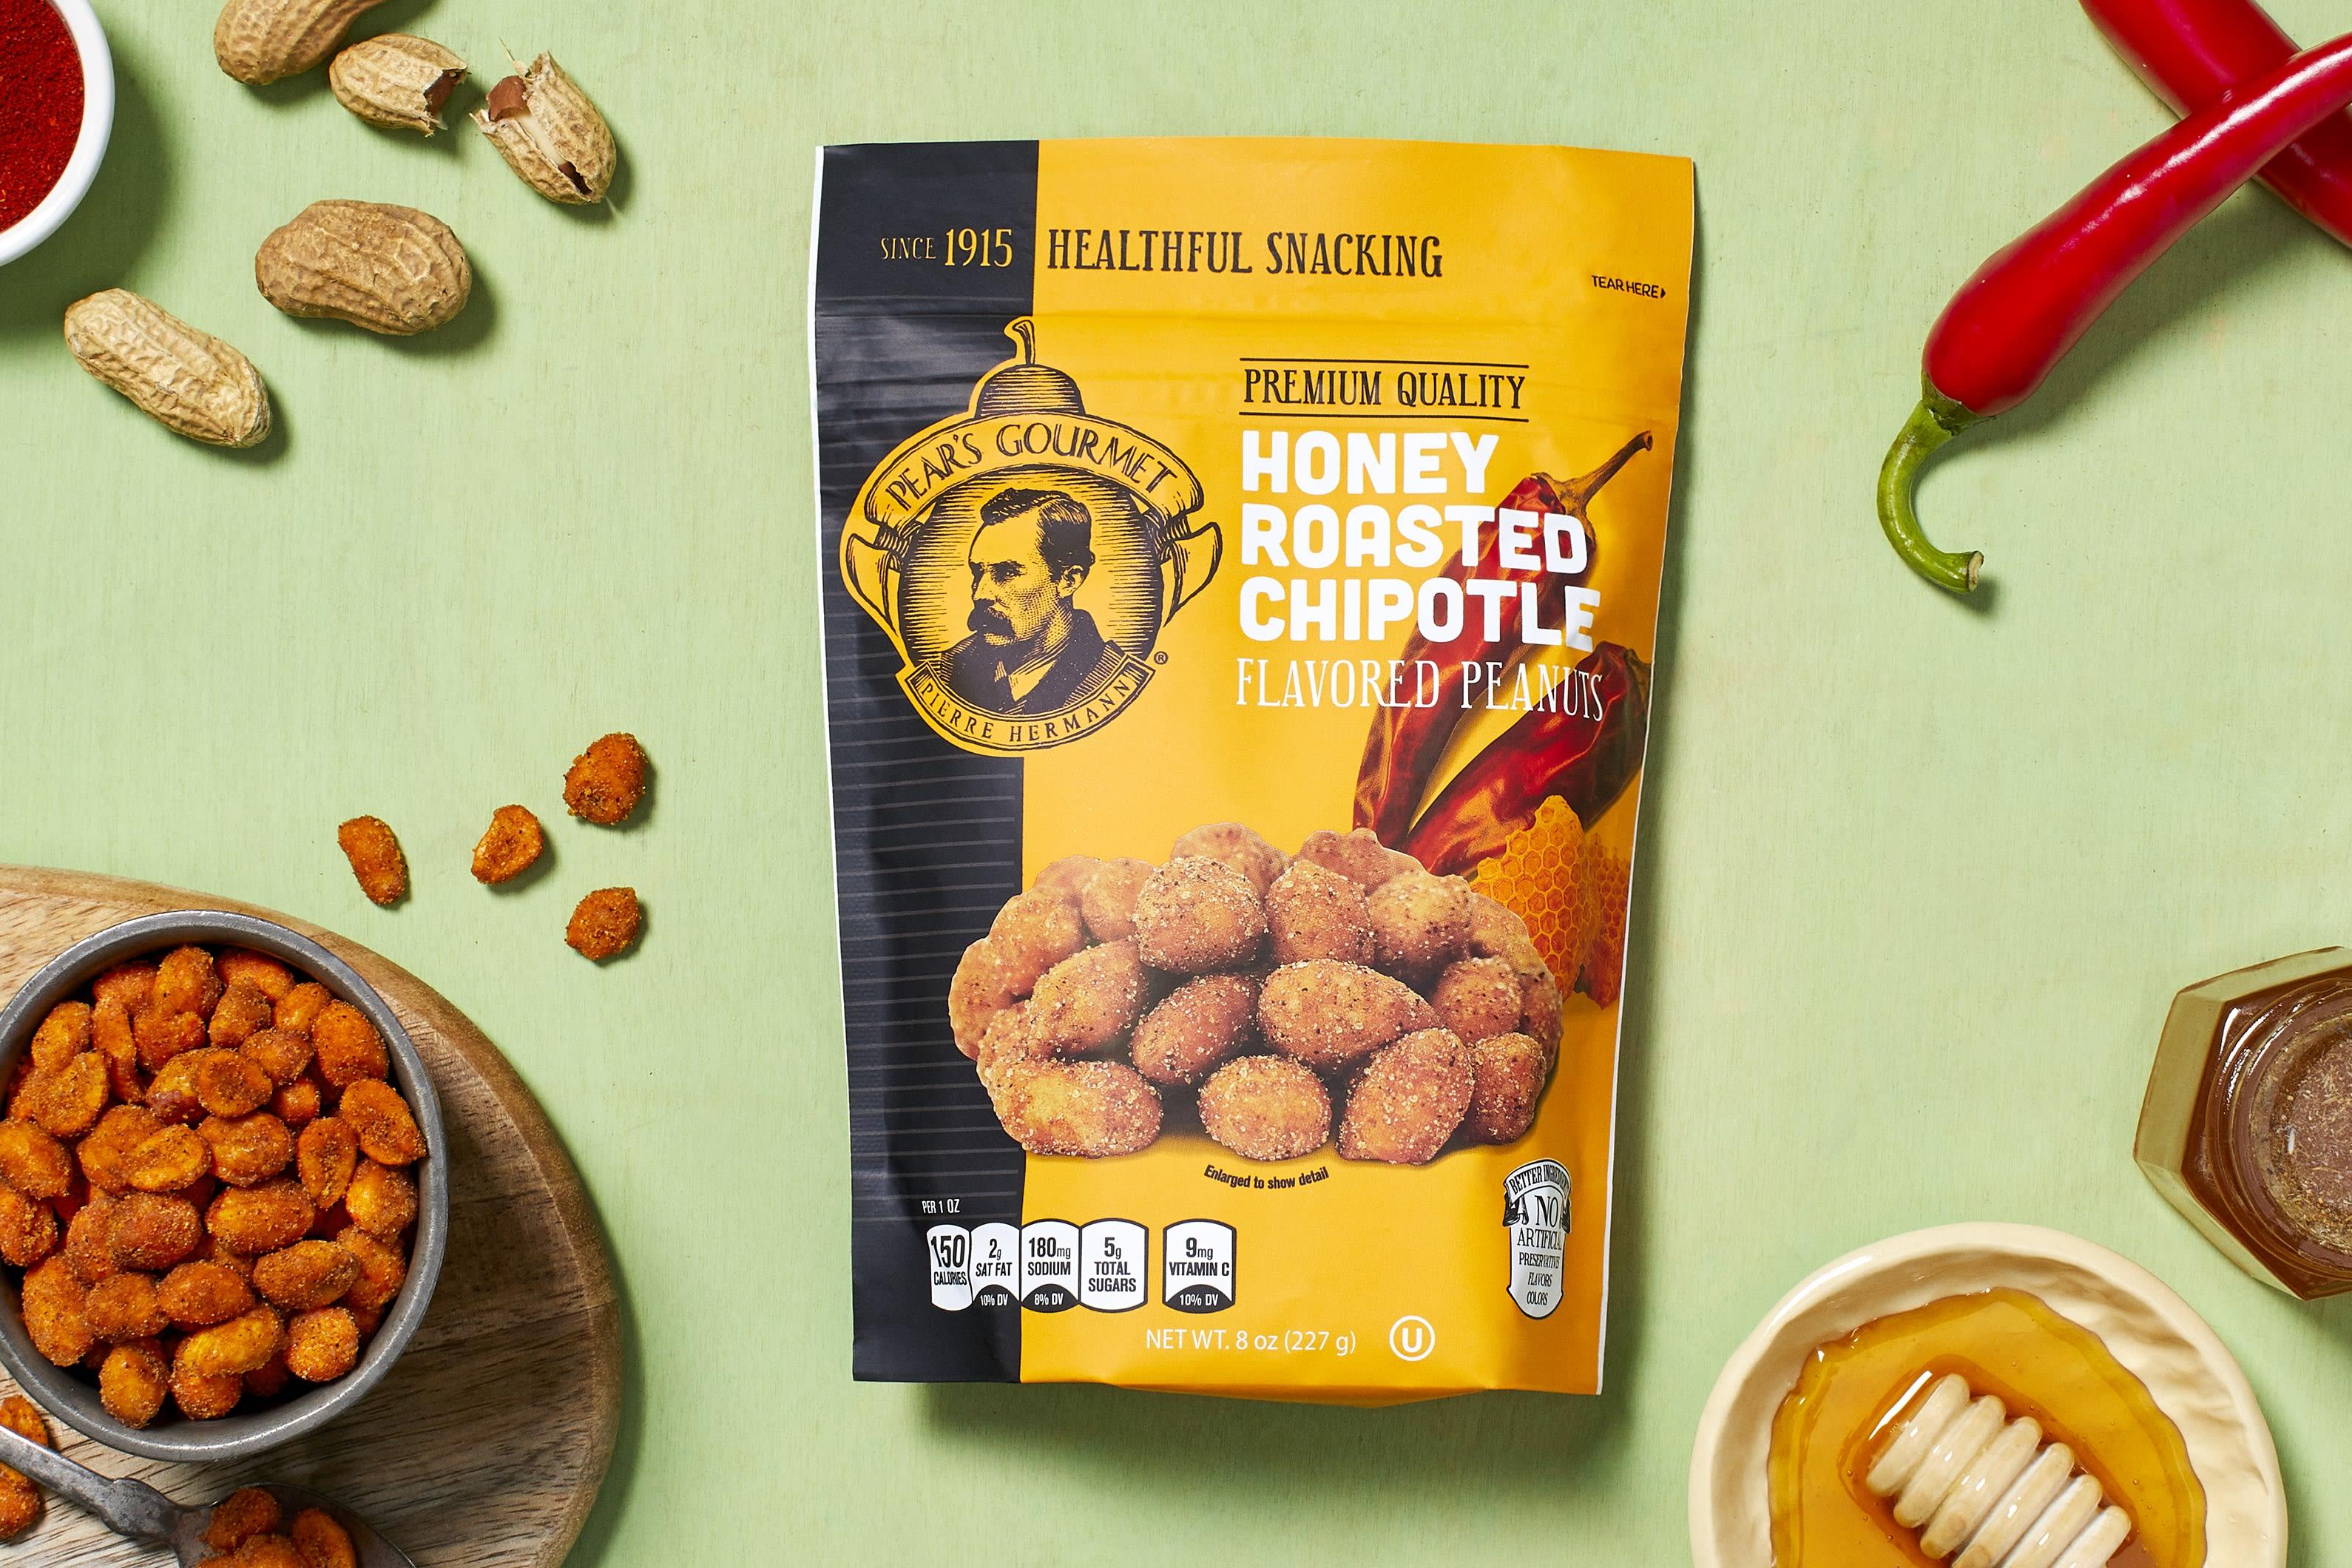 Honey Roasted Chipotle Peanuts